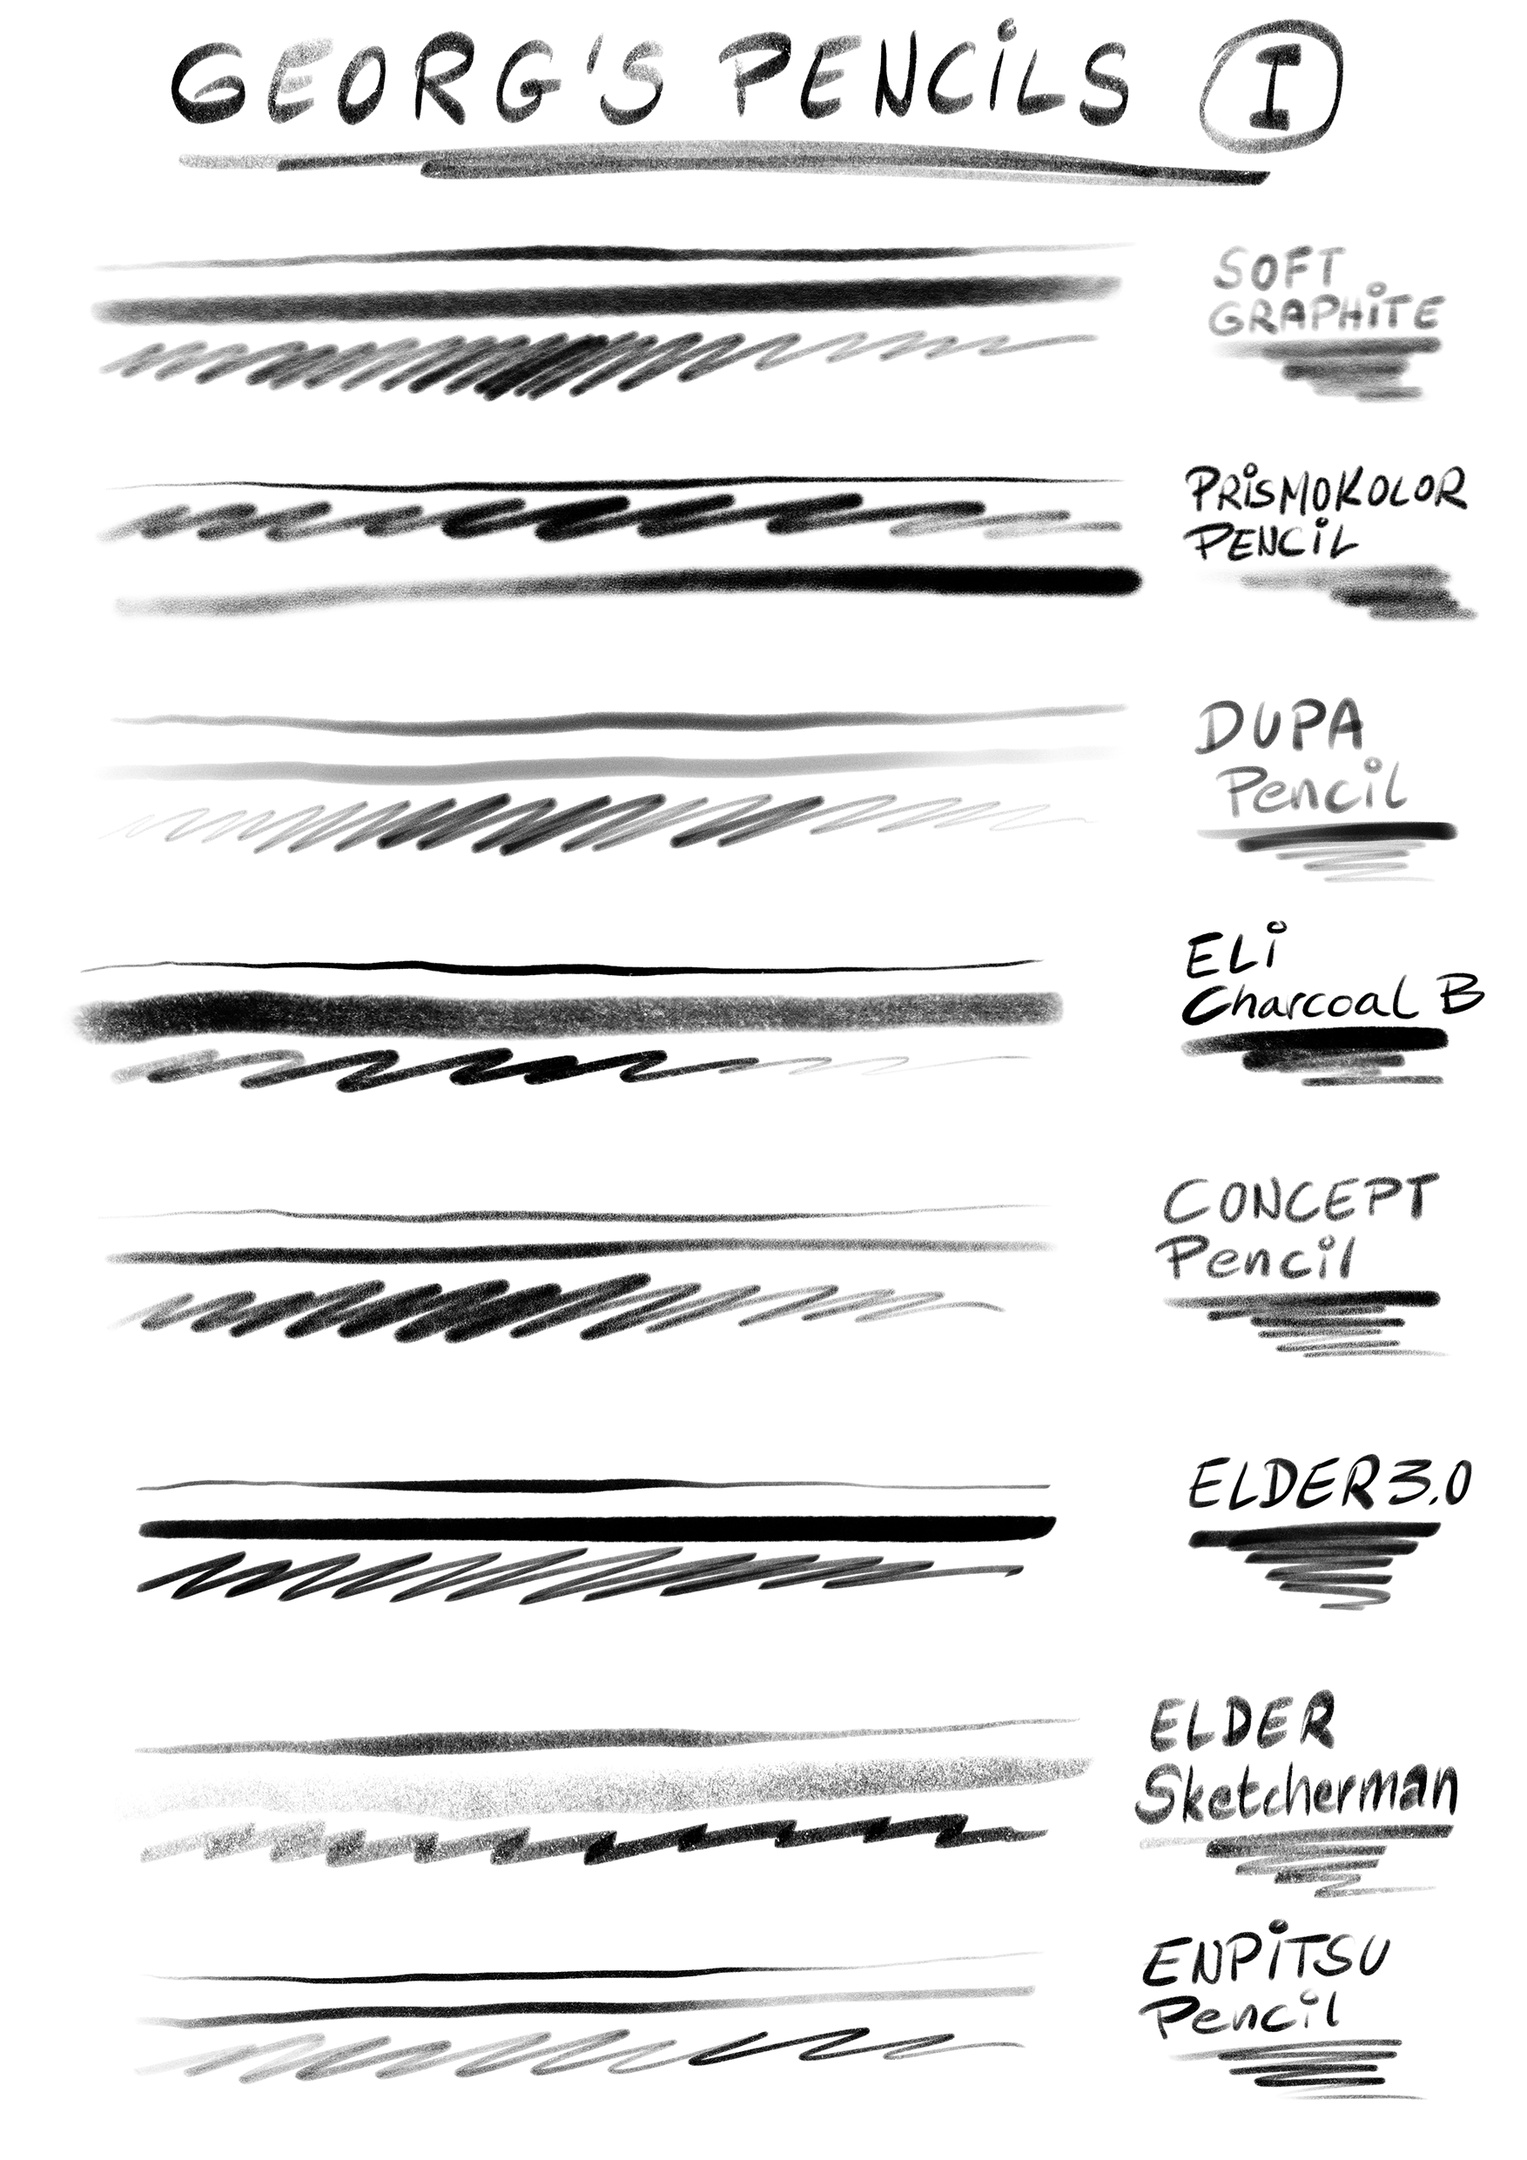 Procreate PENCIL Set: 30+ Pencils, Charcoal, Graphite - Georg's